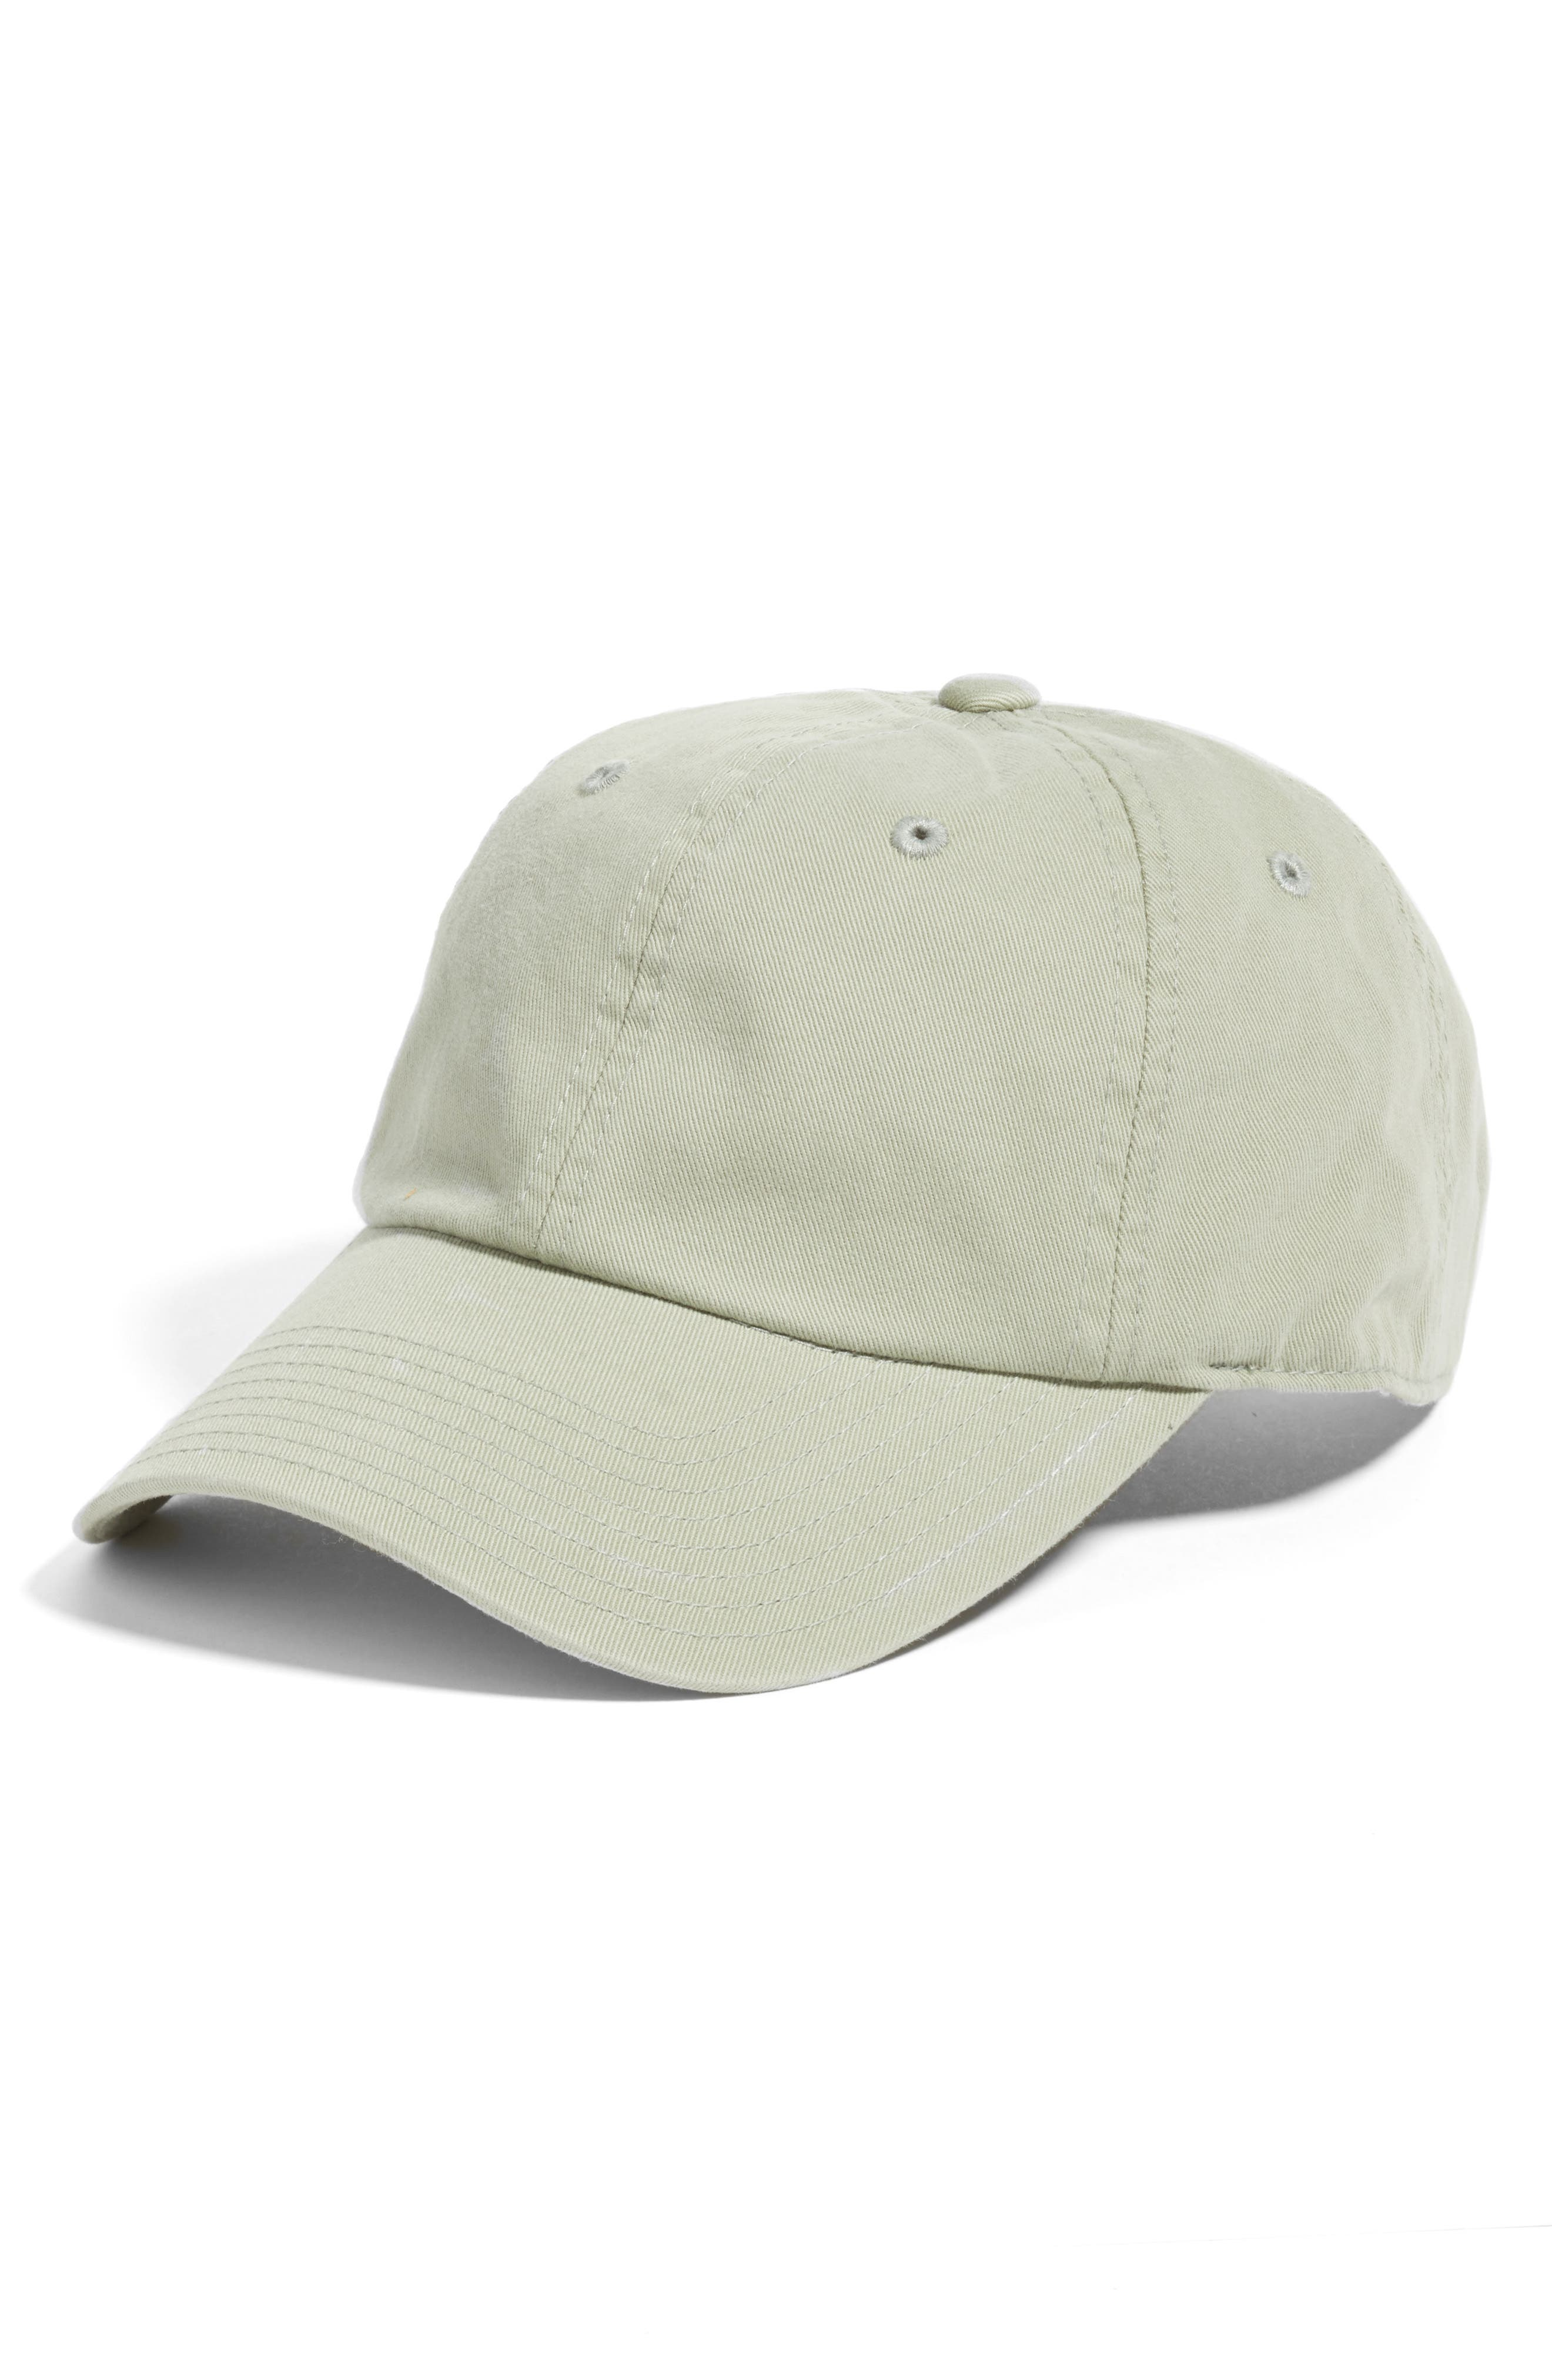 Alternate Image 1 Selected - American Needle Washed Cotton Baseball Cap